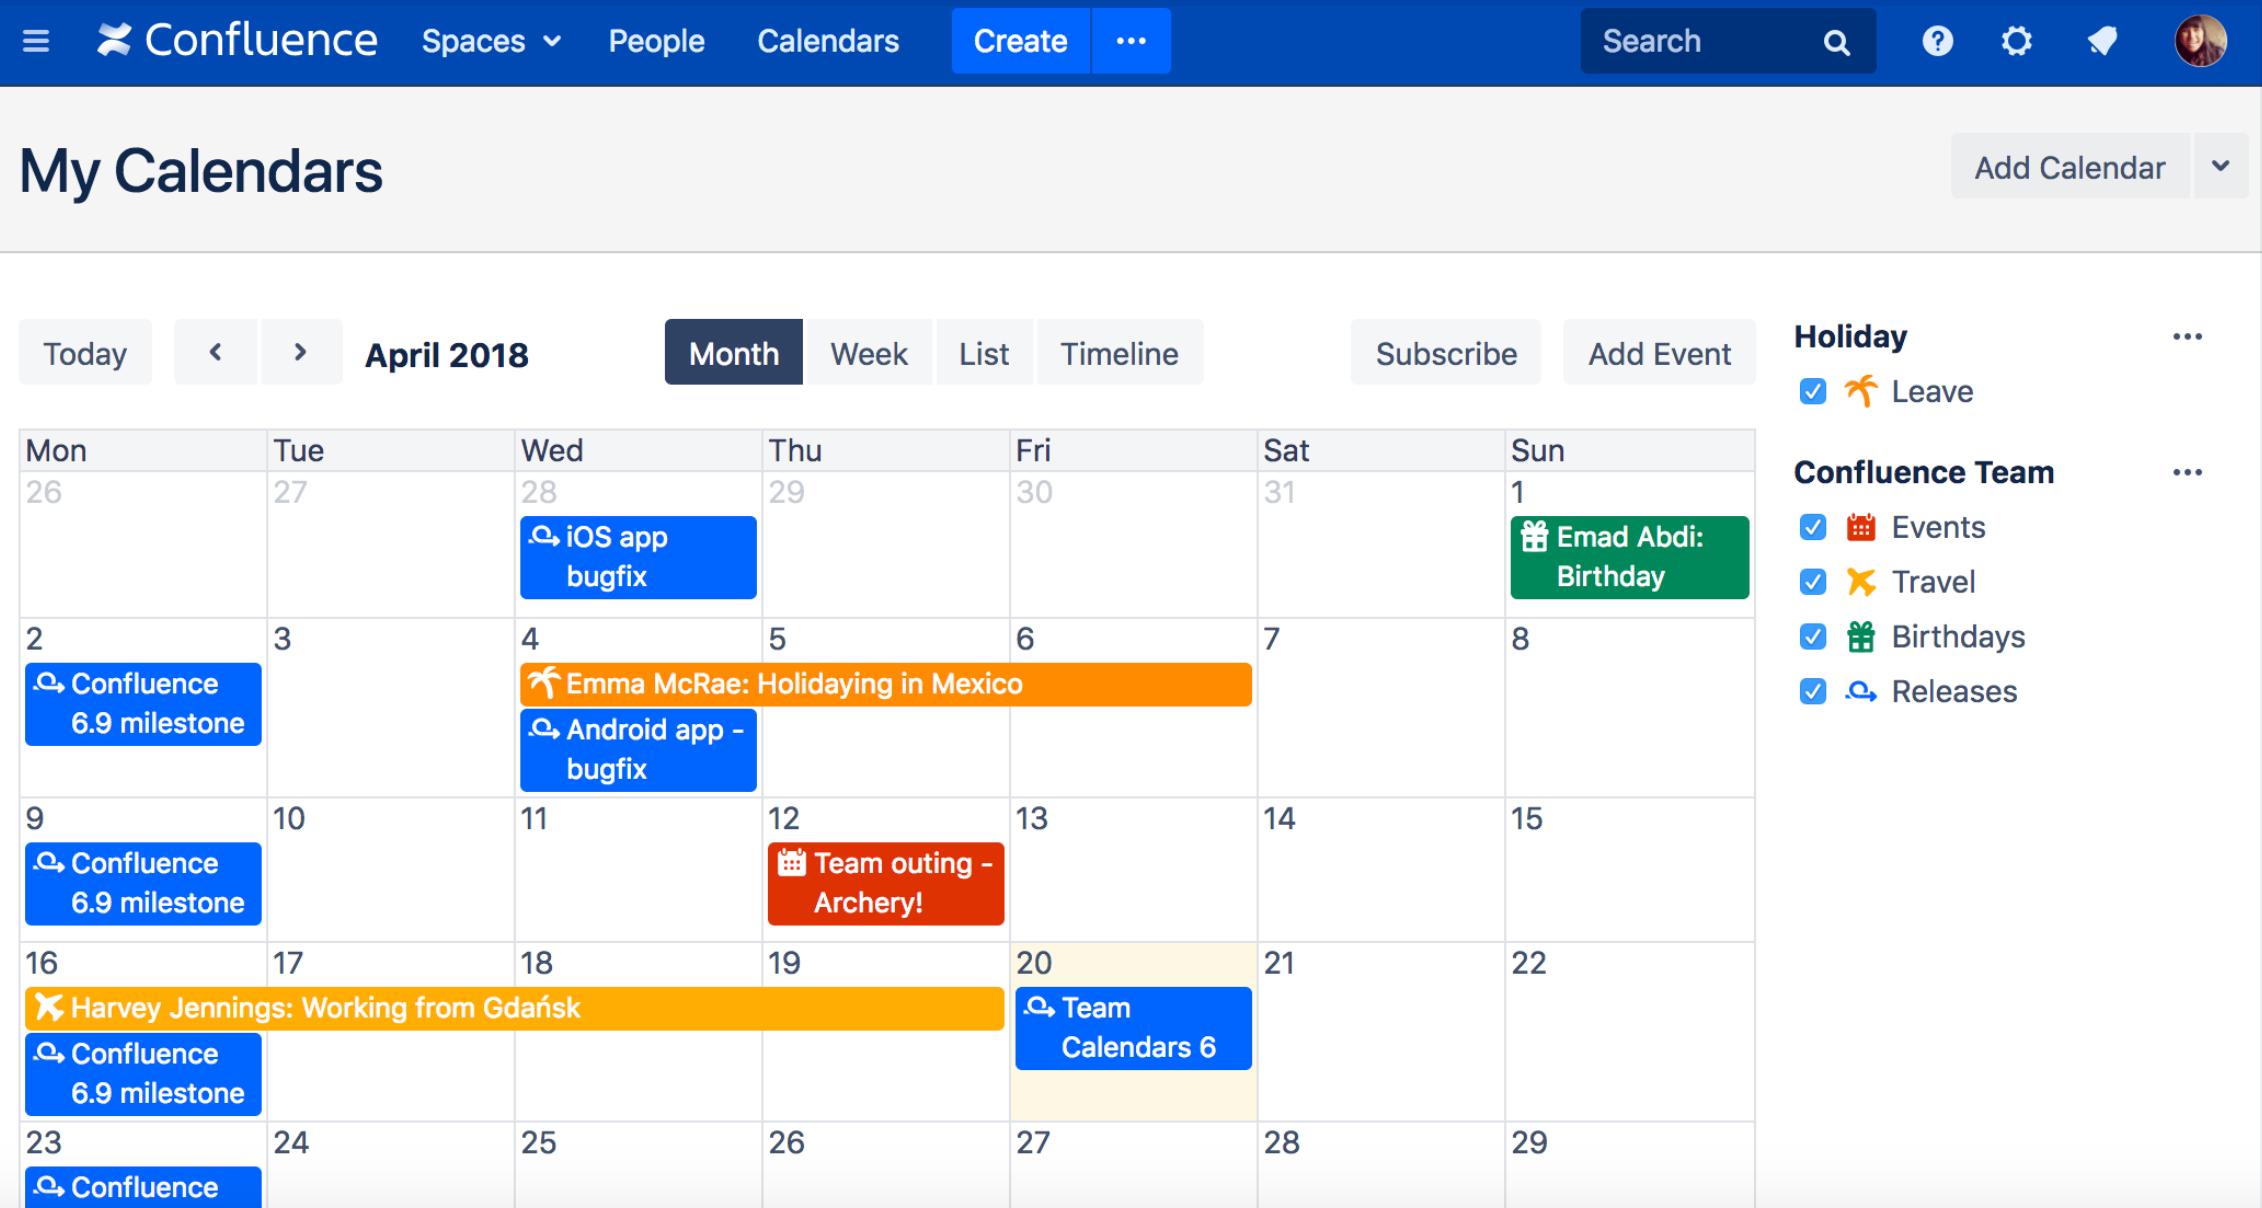 Team Calendars 6 für Confluence